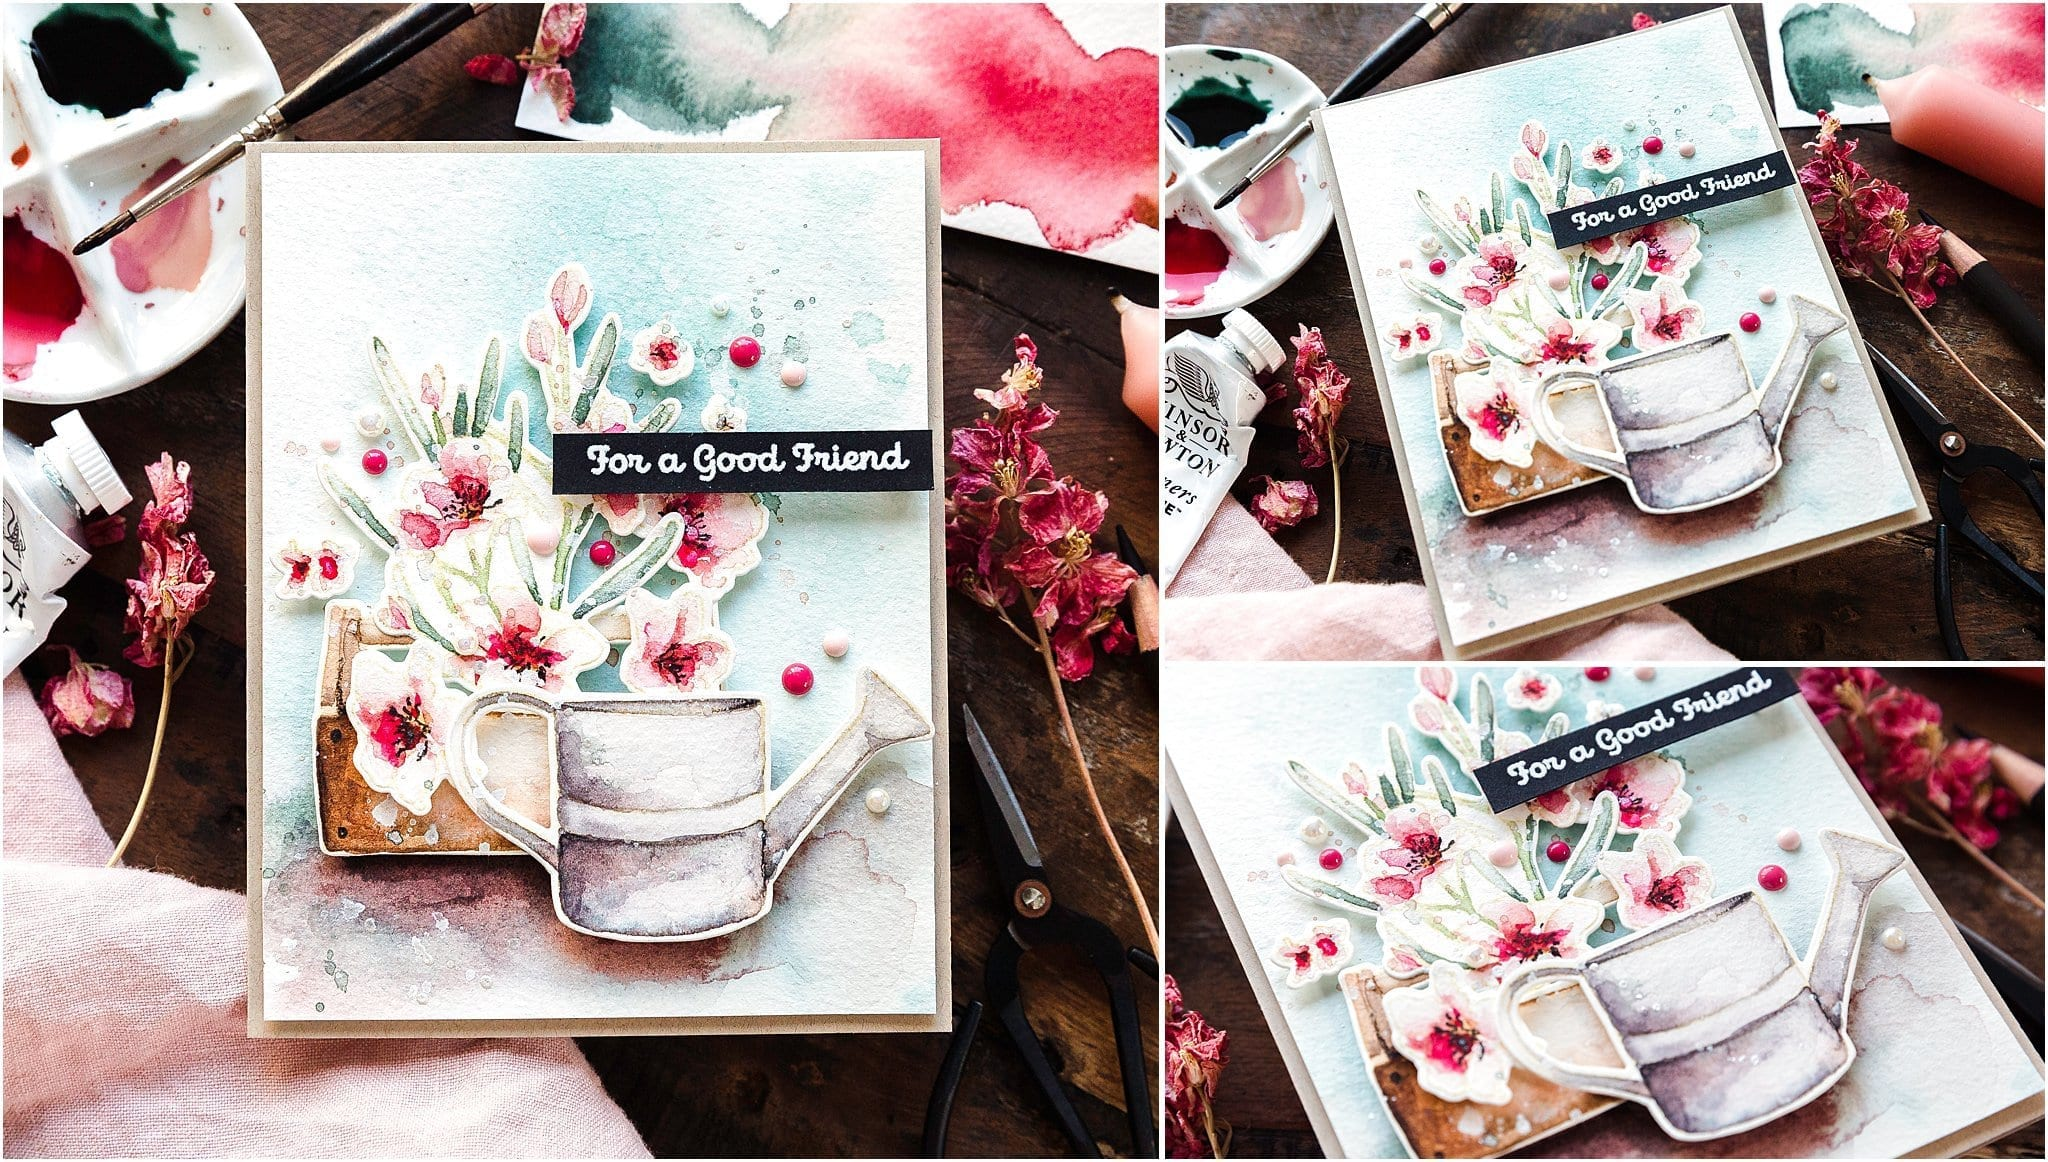 Video tutorial - watercoloured flower garden, handmade card by Debby Hughes using supplies from Simon Says Stamp #debbyhughes #limedoodledesign #handmadecards #cardmaking #cardmakingideas #cardmakingtechniques  #cardmakingtutorials #handmadecardideas #simonsaysstamp